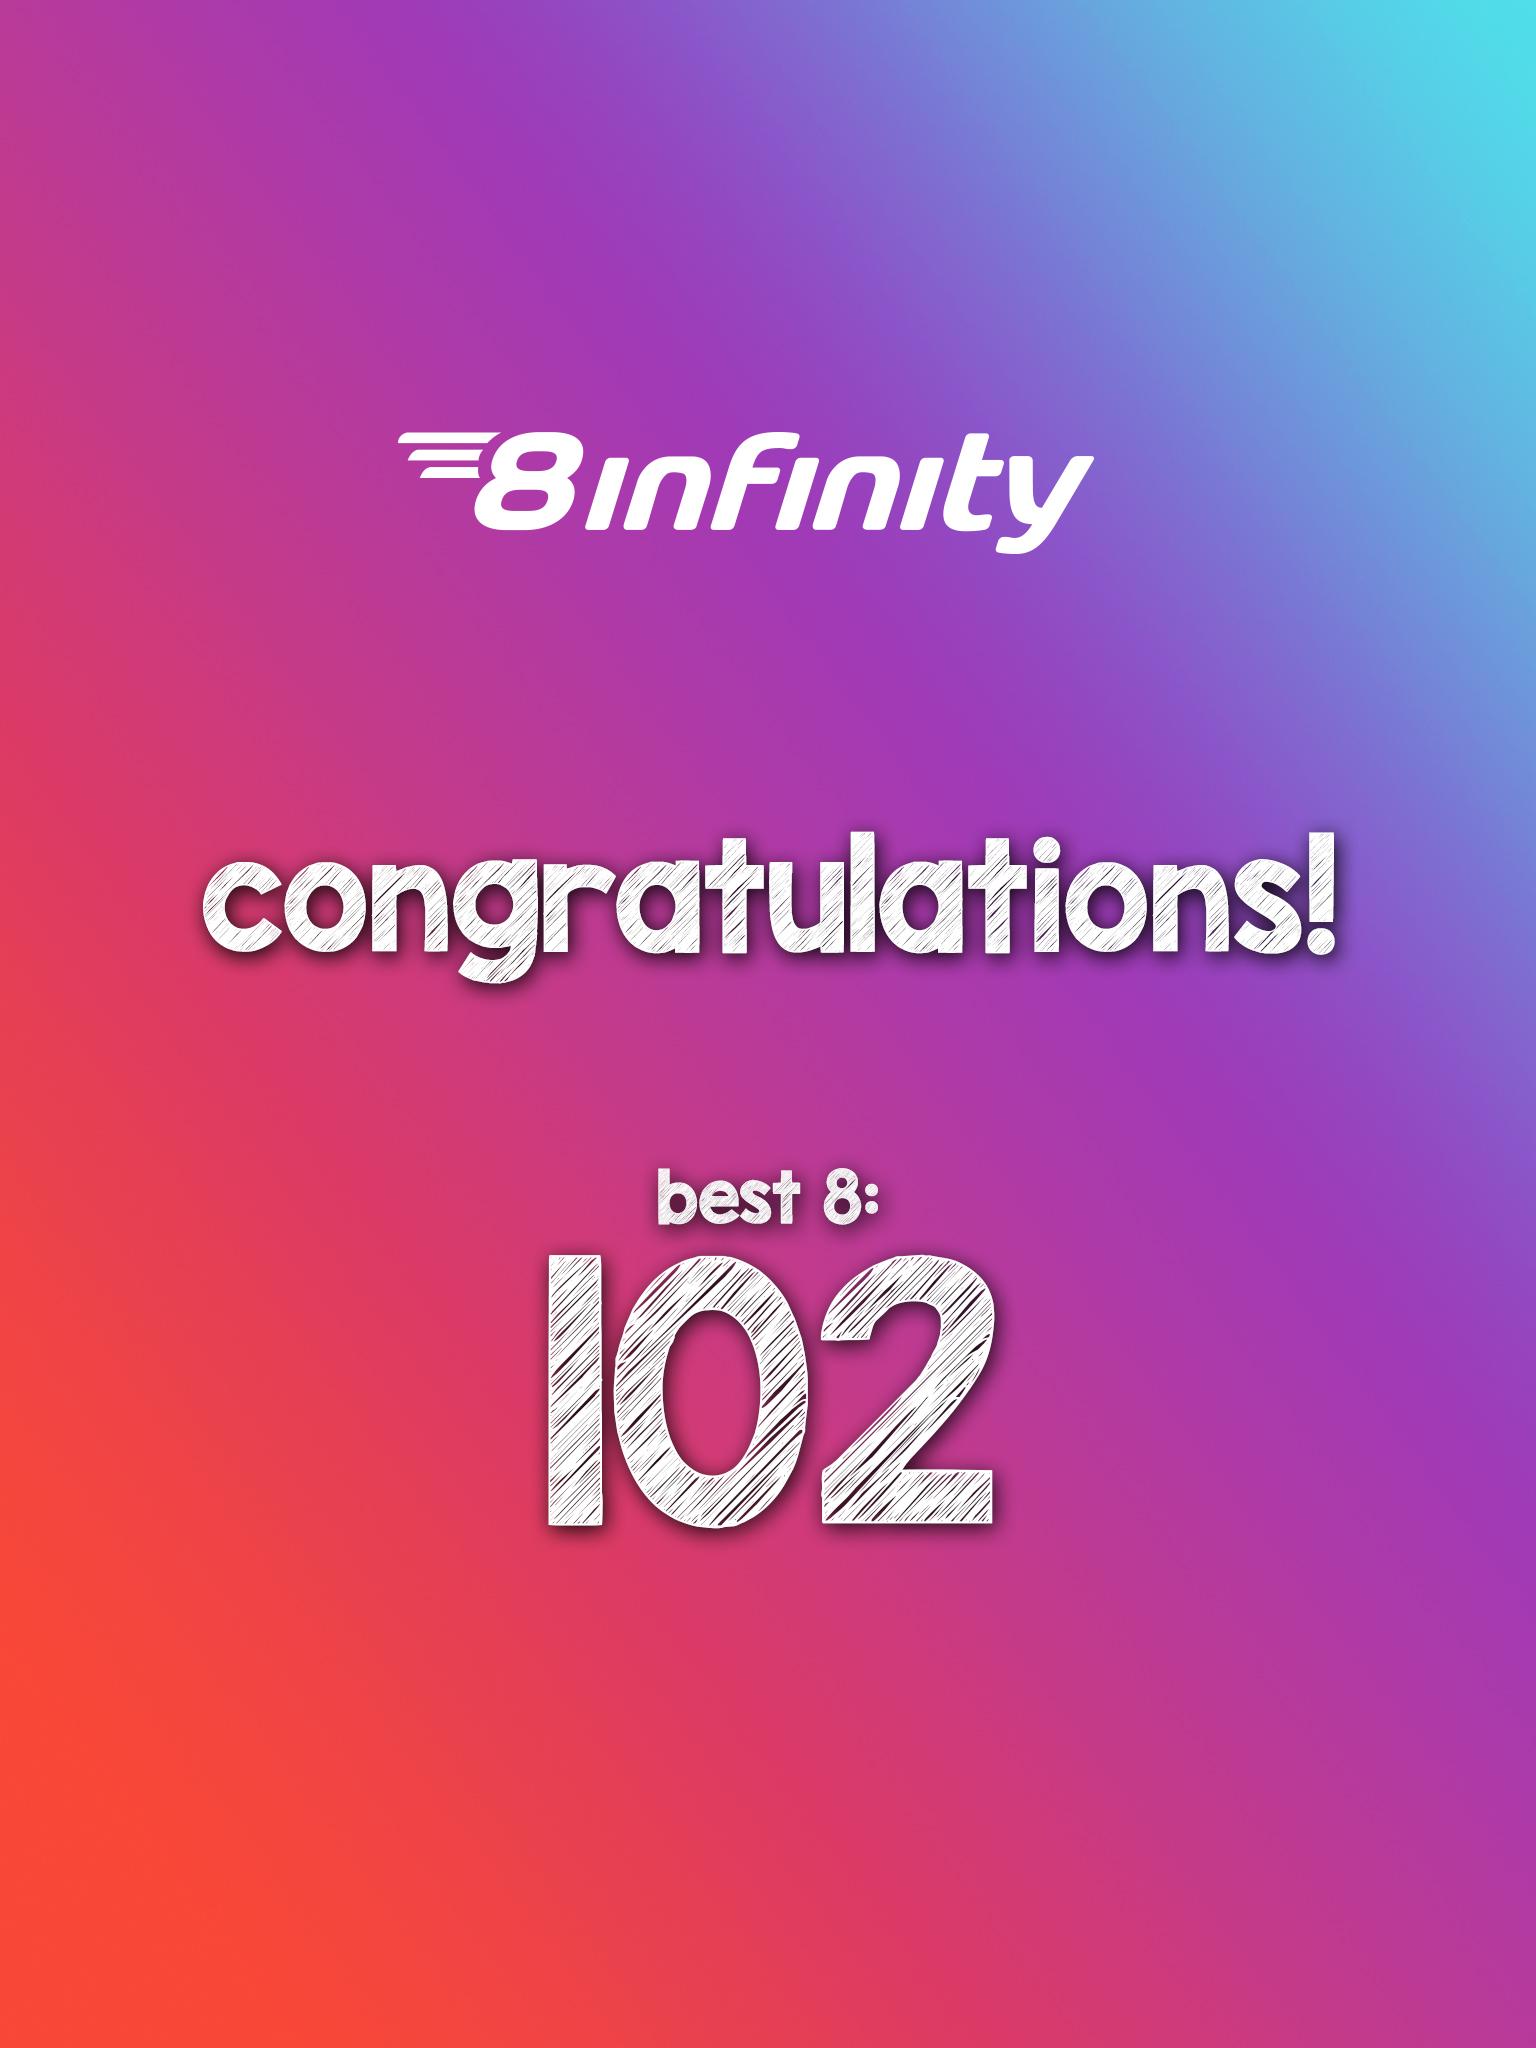 10  8infinity   congratulation